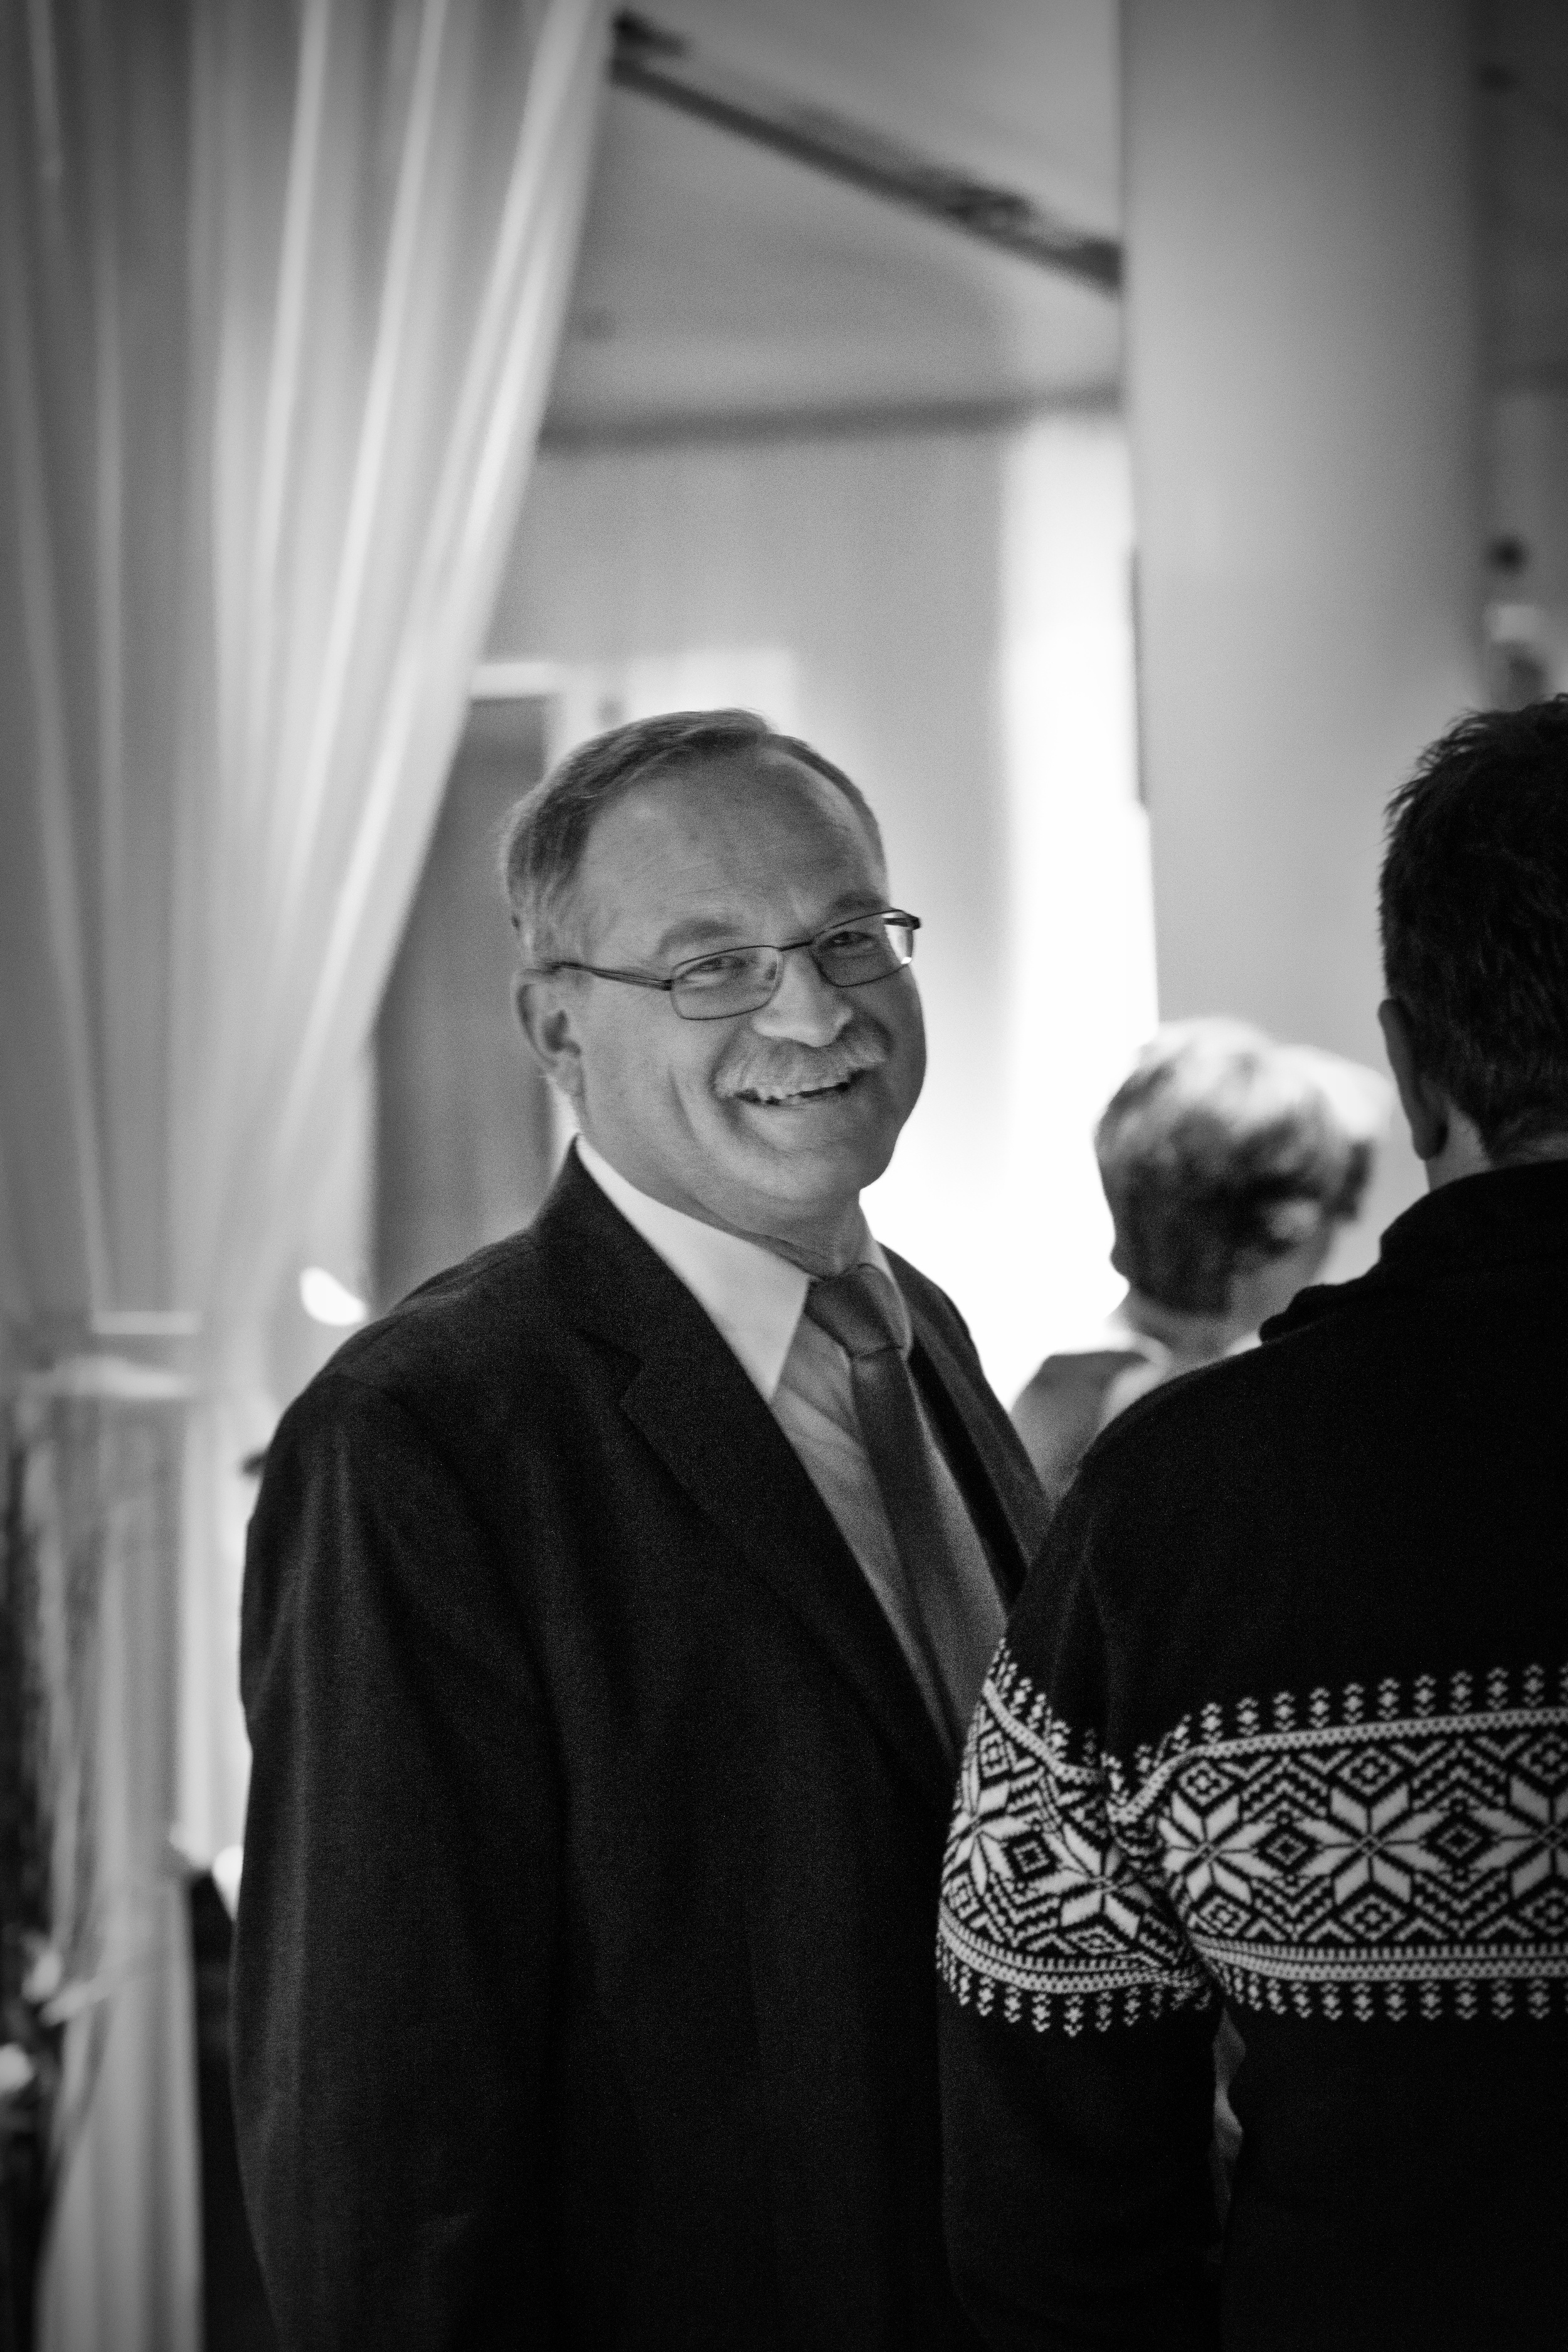 Heinz Wolf, Landesrettungskommandant OeRK Tirol